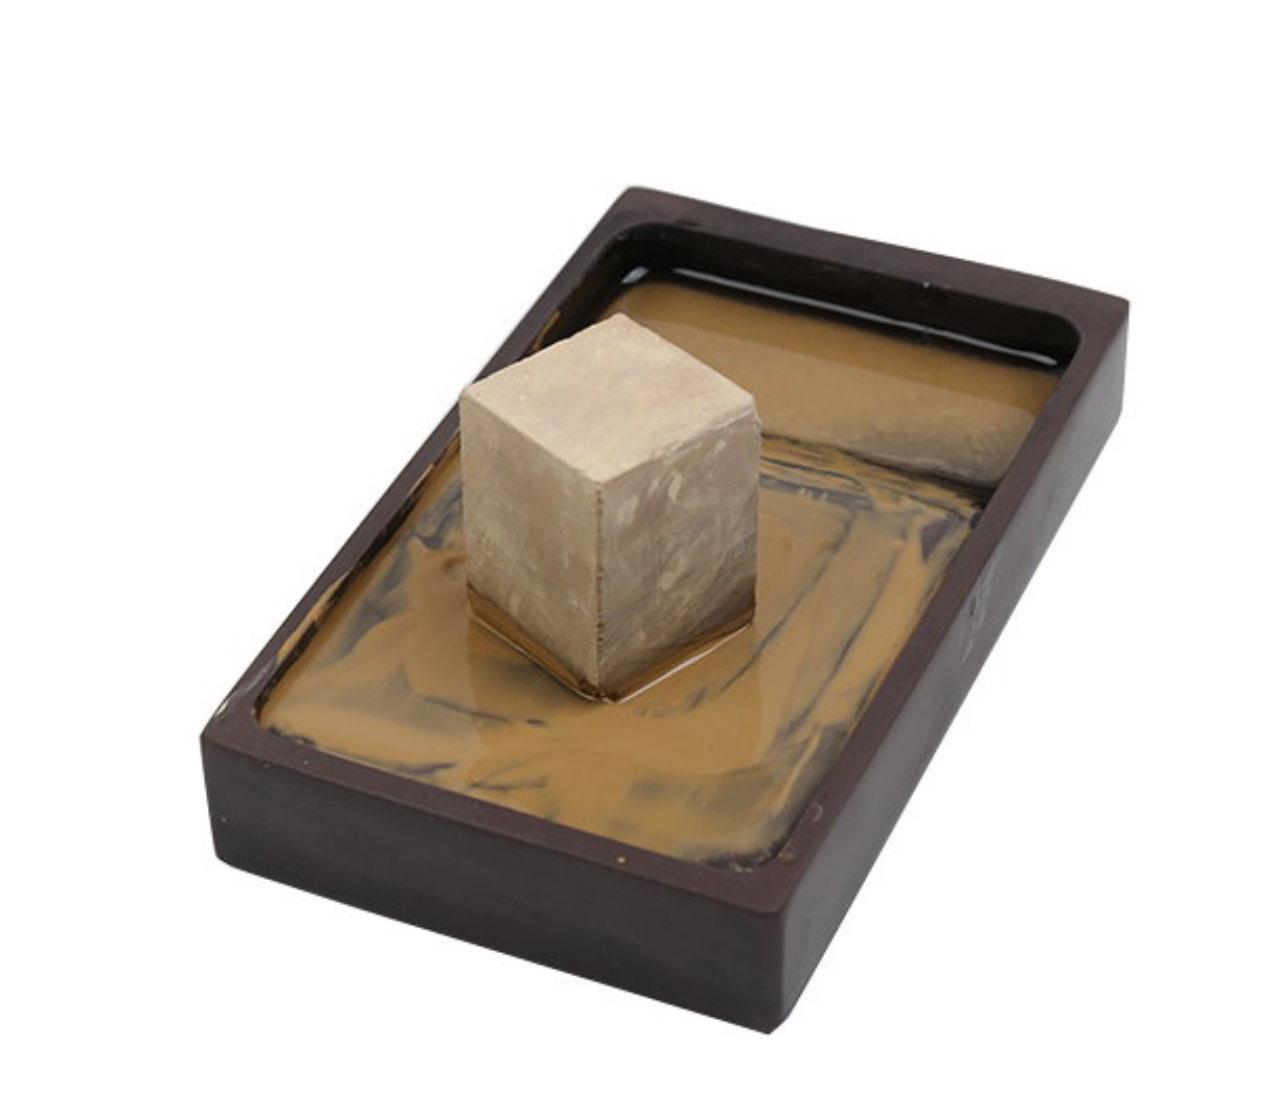 inkstone cleaner partir de sur inkston. Black Bedroom Furniture Sets. Home Design Ideas